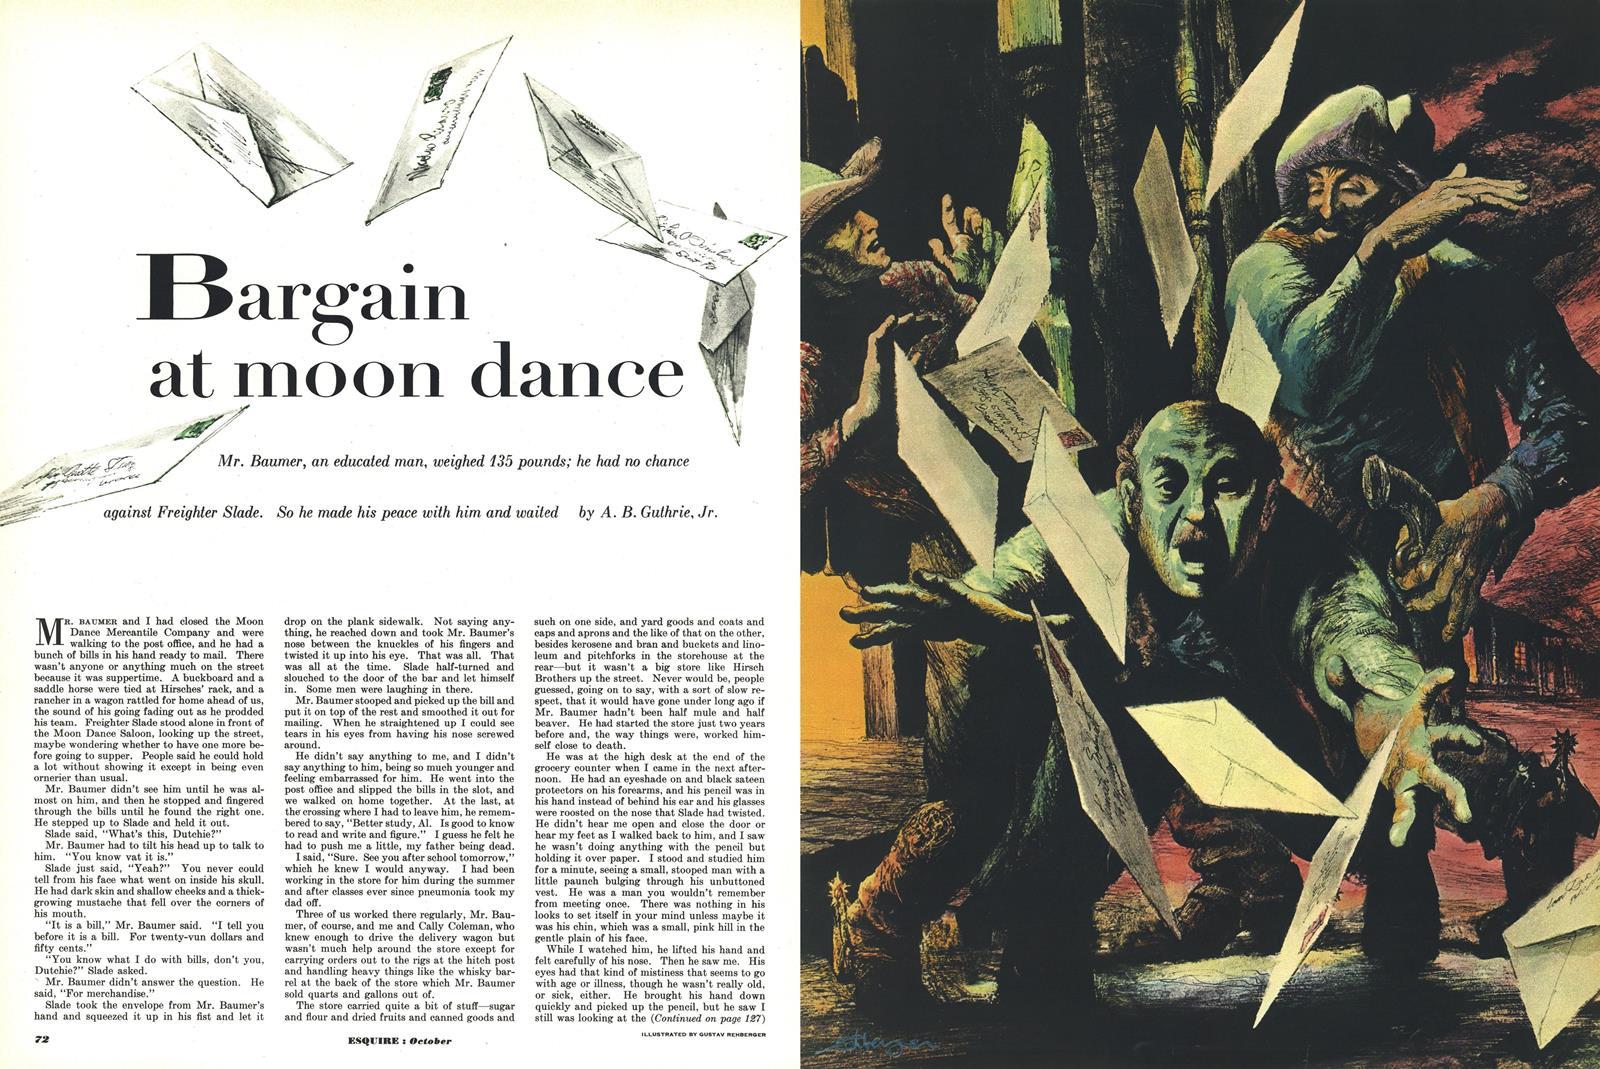 October 1952 - Bargain at Moon Dance